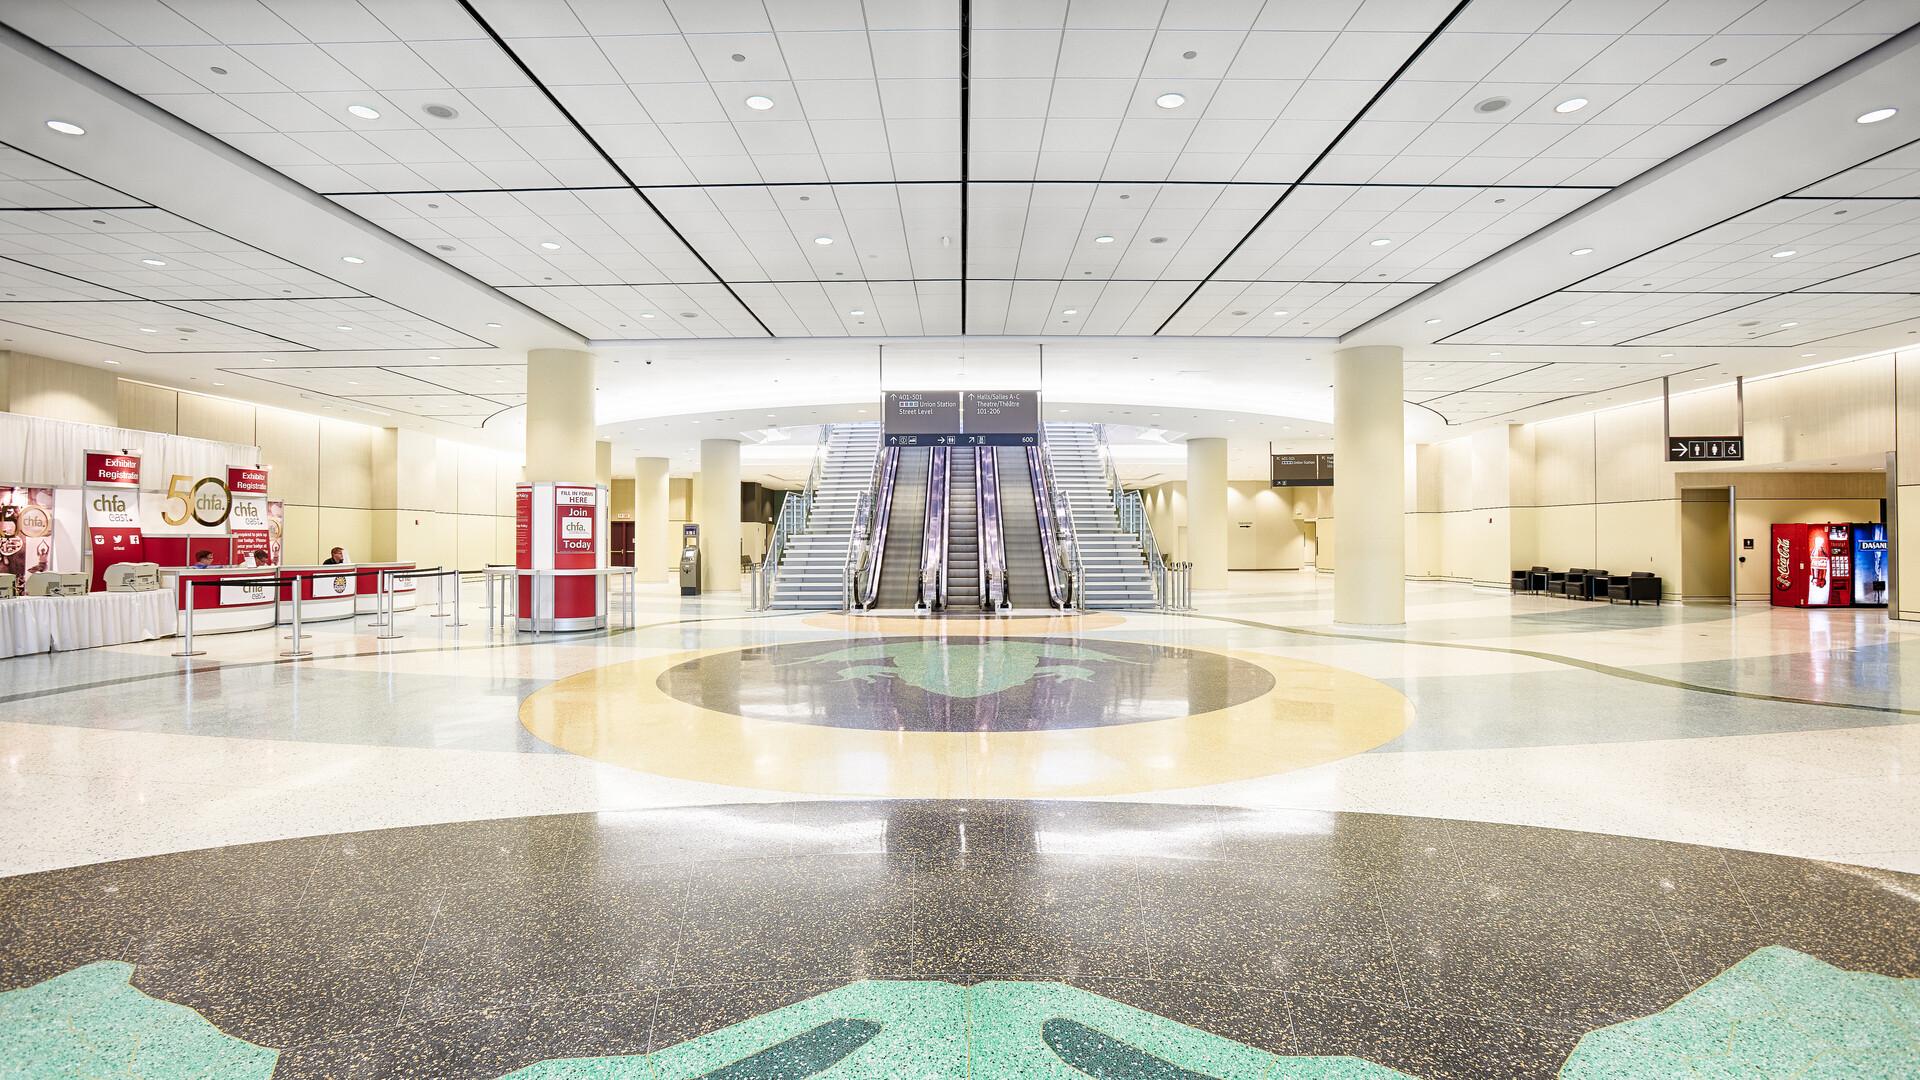 Metro Toronto Convention Centre (MTCC), Toronto, Canada, 3771,9m2, B + H Architects, Showtech Power & Lighting, LEED, Bochsler Creative Solutions, Koral, Square Tegular, 2' x 2', White